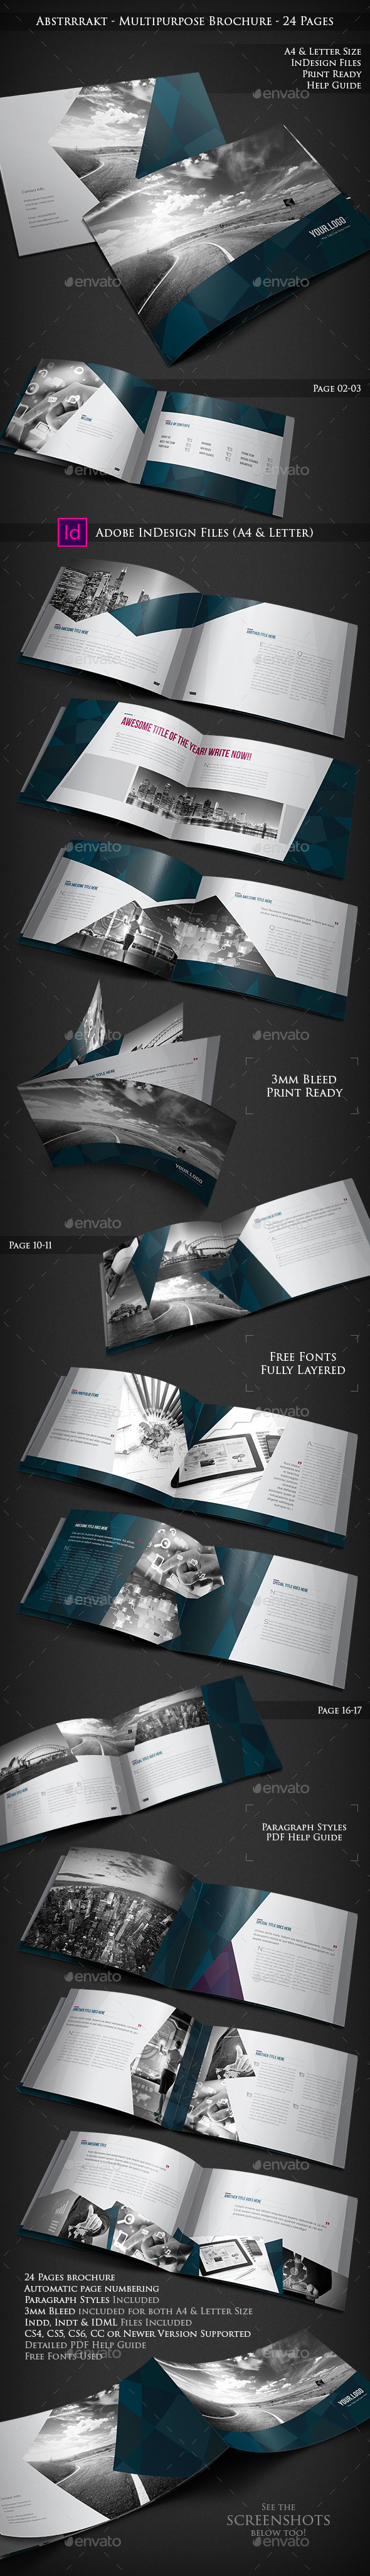 Abstrrrakt - Multipurpose Brochure - 24 Pages - Portfolio Brochures